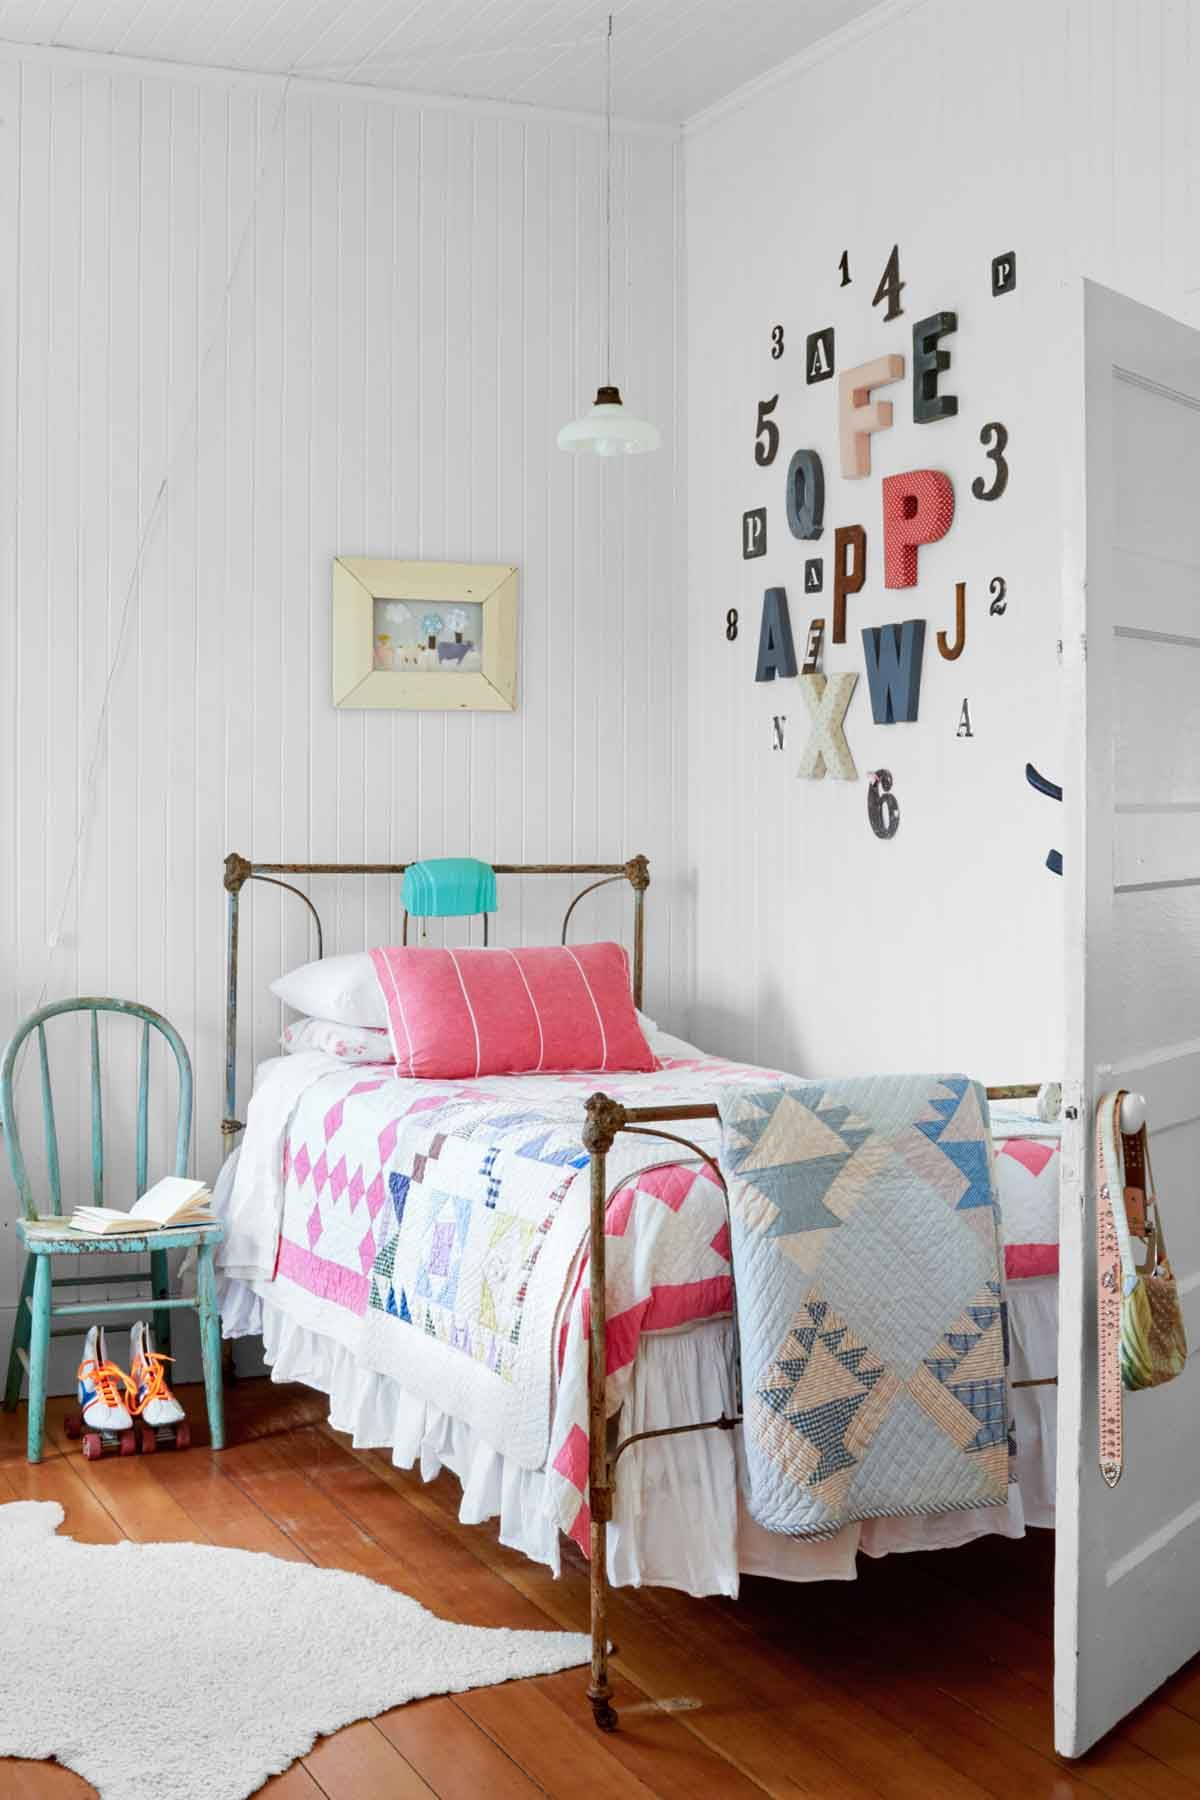 girls room decor ideas 12 Fun Girl's Bedroom Decor Ideas   Cute Room Decorating for Girls girls room decor ideas